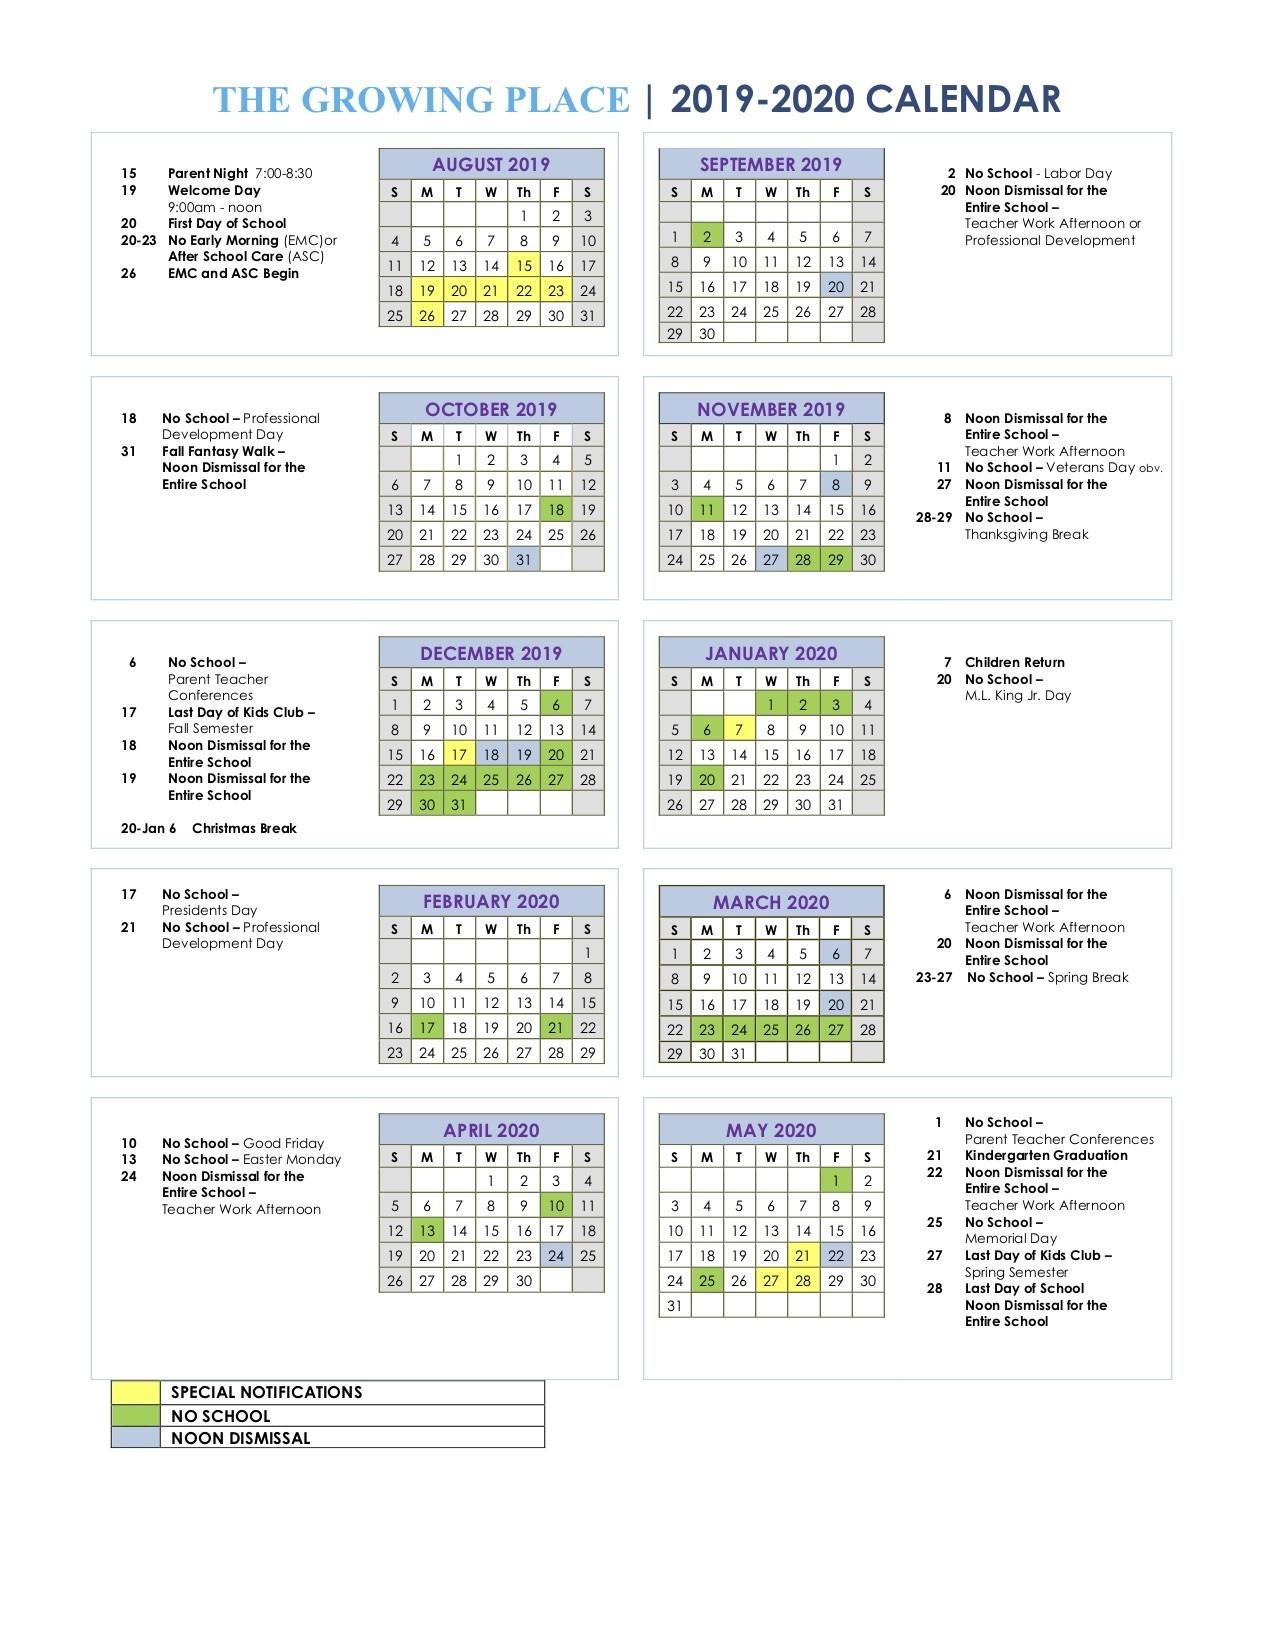 The Growing Place Calendar  Methadist Liturgical Calendar 2020 2020